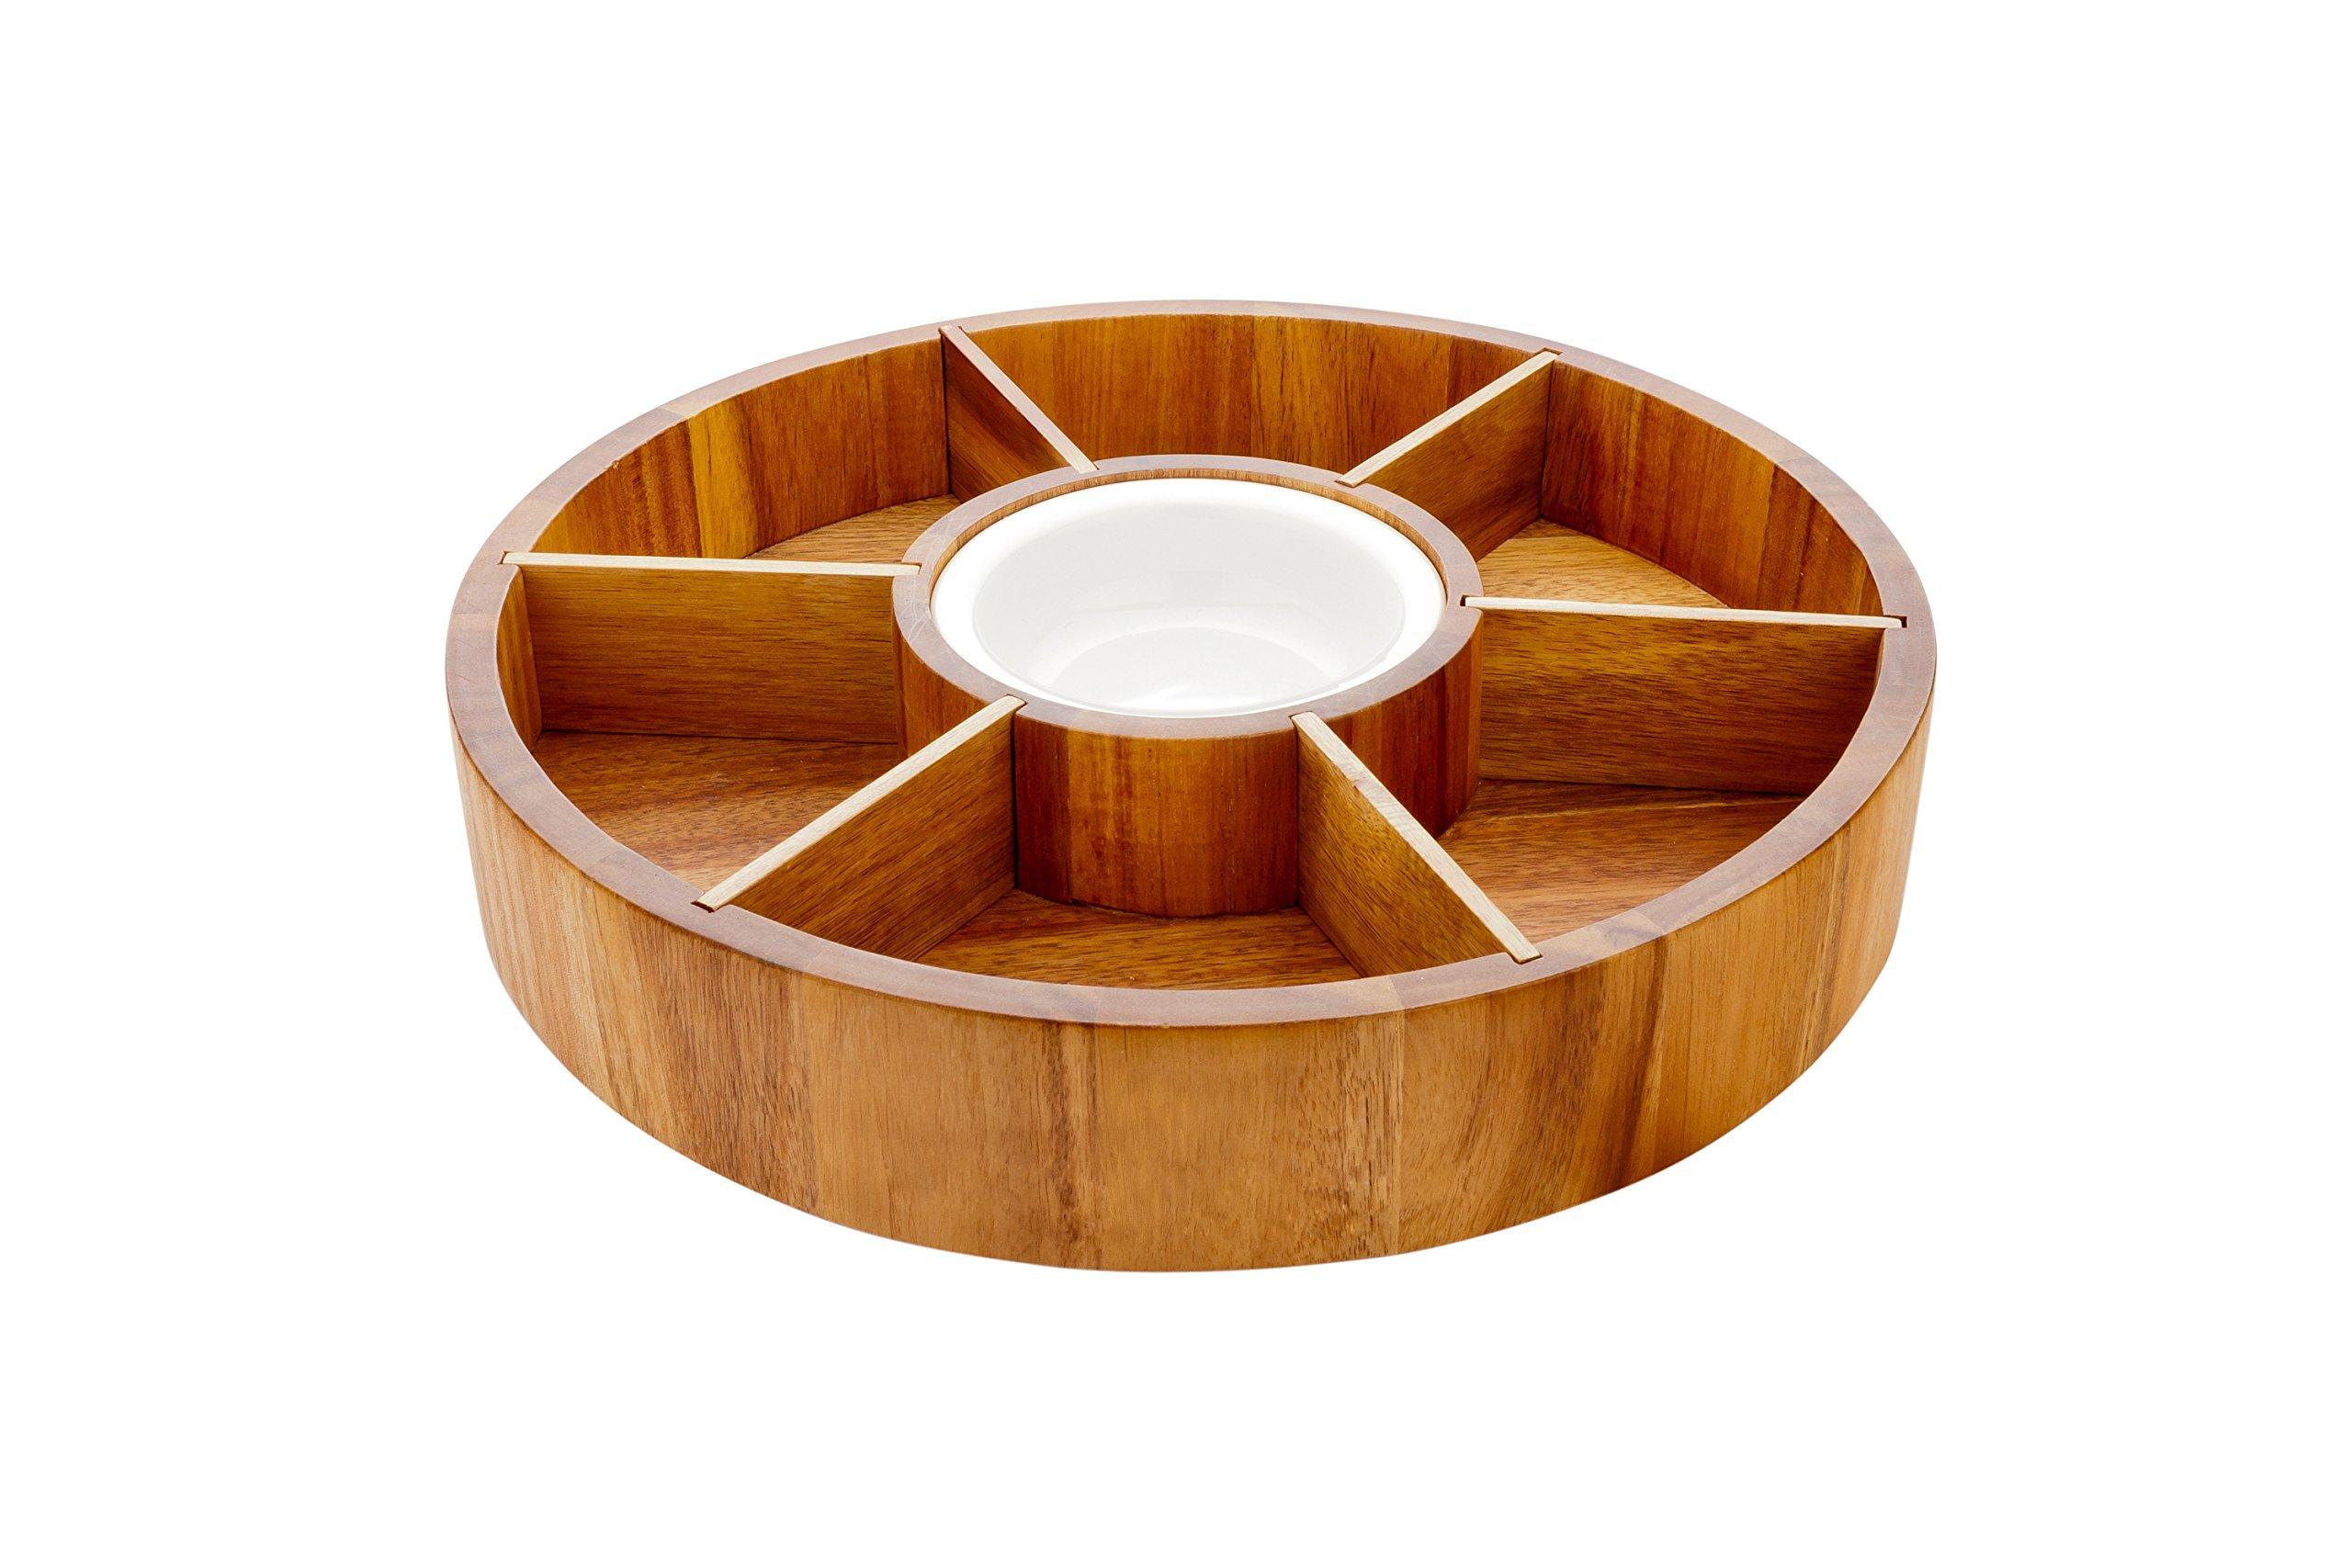 Chips and Dip Bowl, Salsa Serving Platter, Wooden Chip Dip Bowl - 12'' - Acacia Wood & Porcelain Dip Bowl - Snacks, Chips, Hummus - 1ct Box - Restaurantware